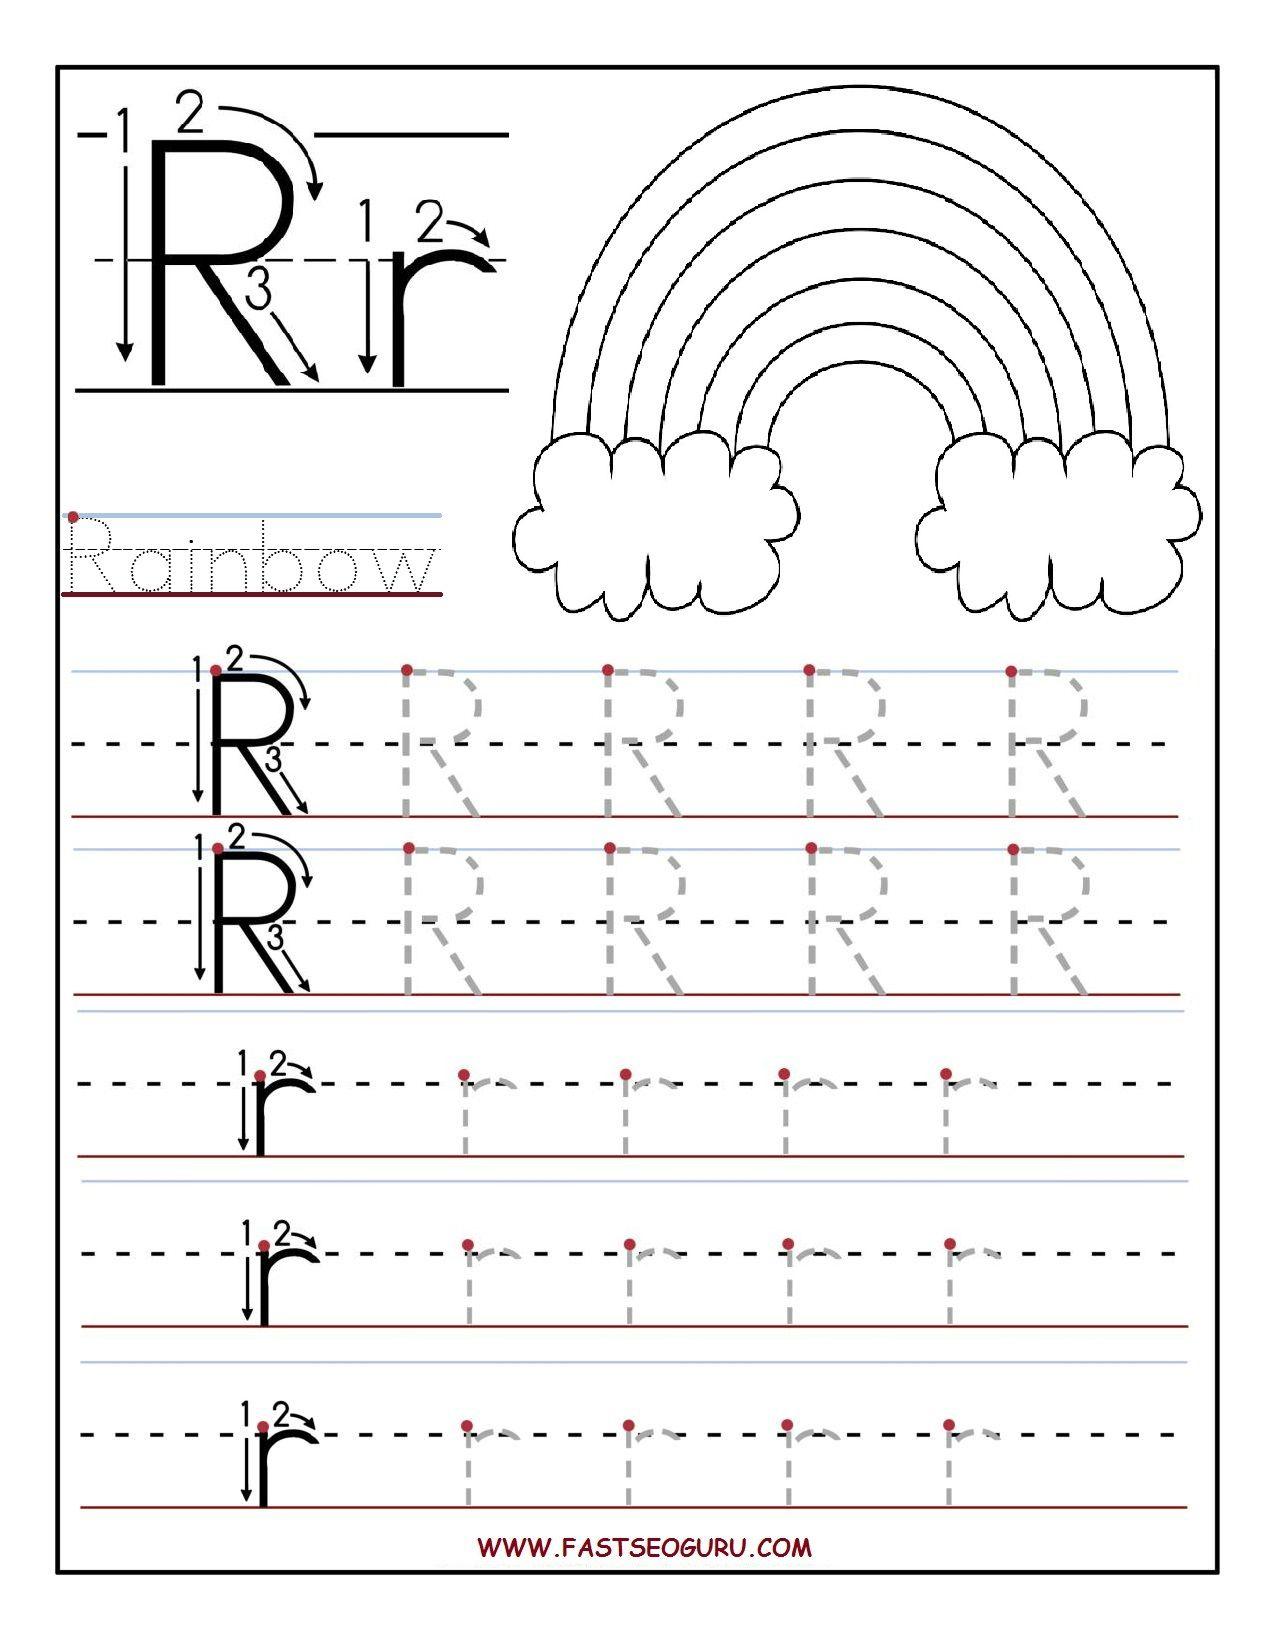 Printable Letter R Tracing Worksheets For Preschool in Alphabet R Worksheets